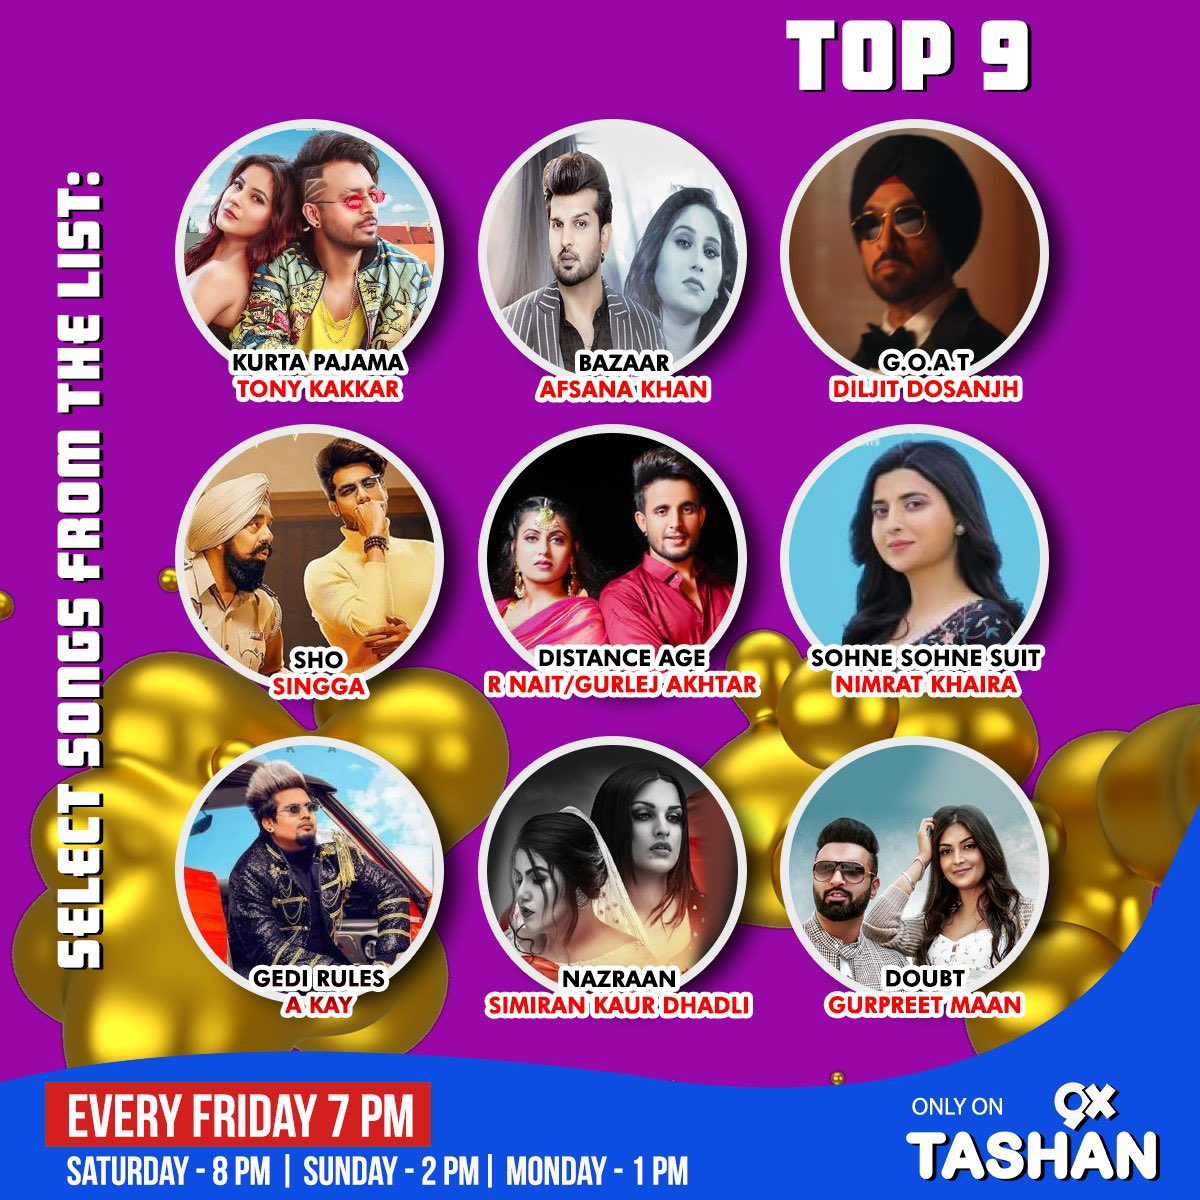 #KurtaPajama on the top of #TashanTop9 charts  @TonyKakkar #TonyKakkar  Congratulations Handsome #ShehnaazGill @ishehnaaz_gill @DesiMFactory #9xtashan #punjabihits #punjabimusic pic.twitter.com/0fjQ7O3eDu